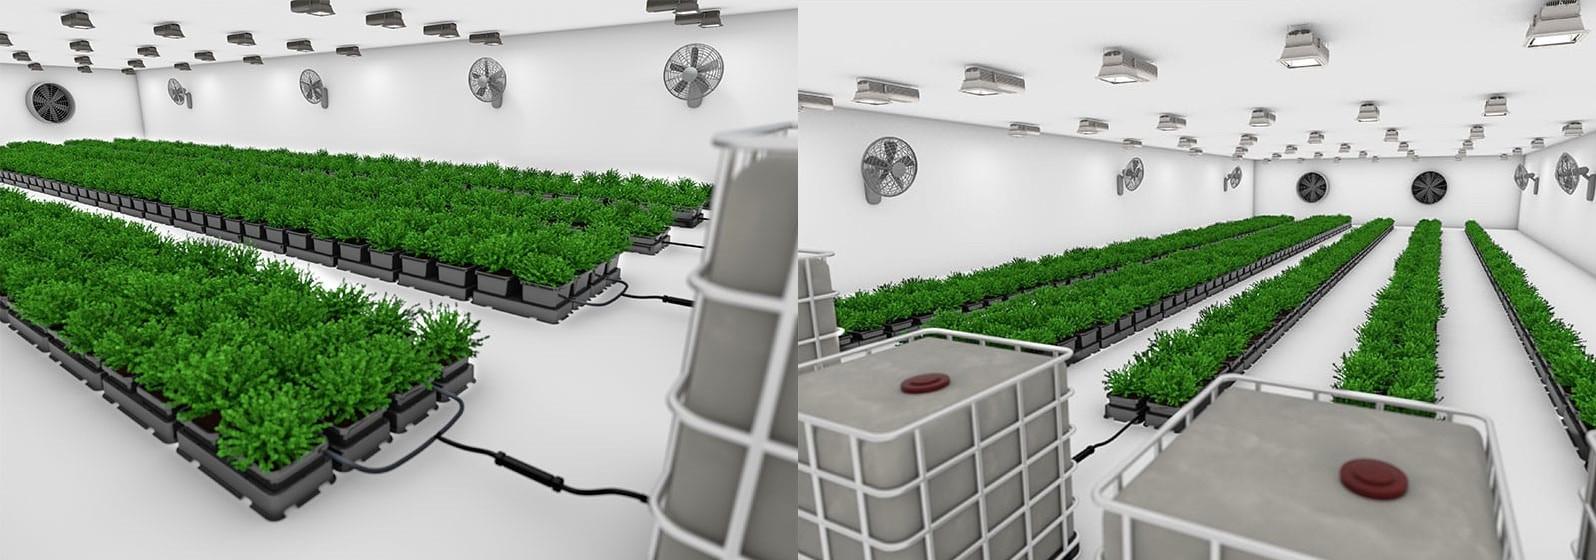 Easy2Grow 16 System Autopot - напоителна система